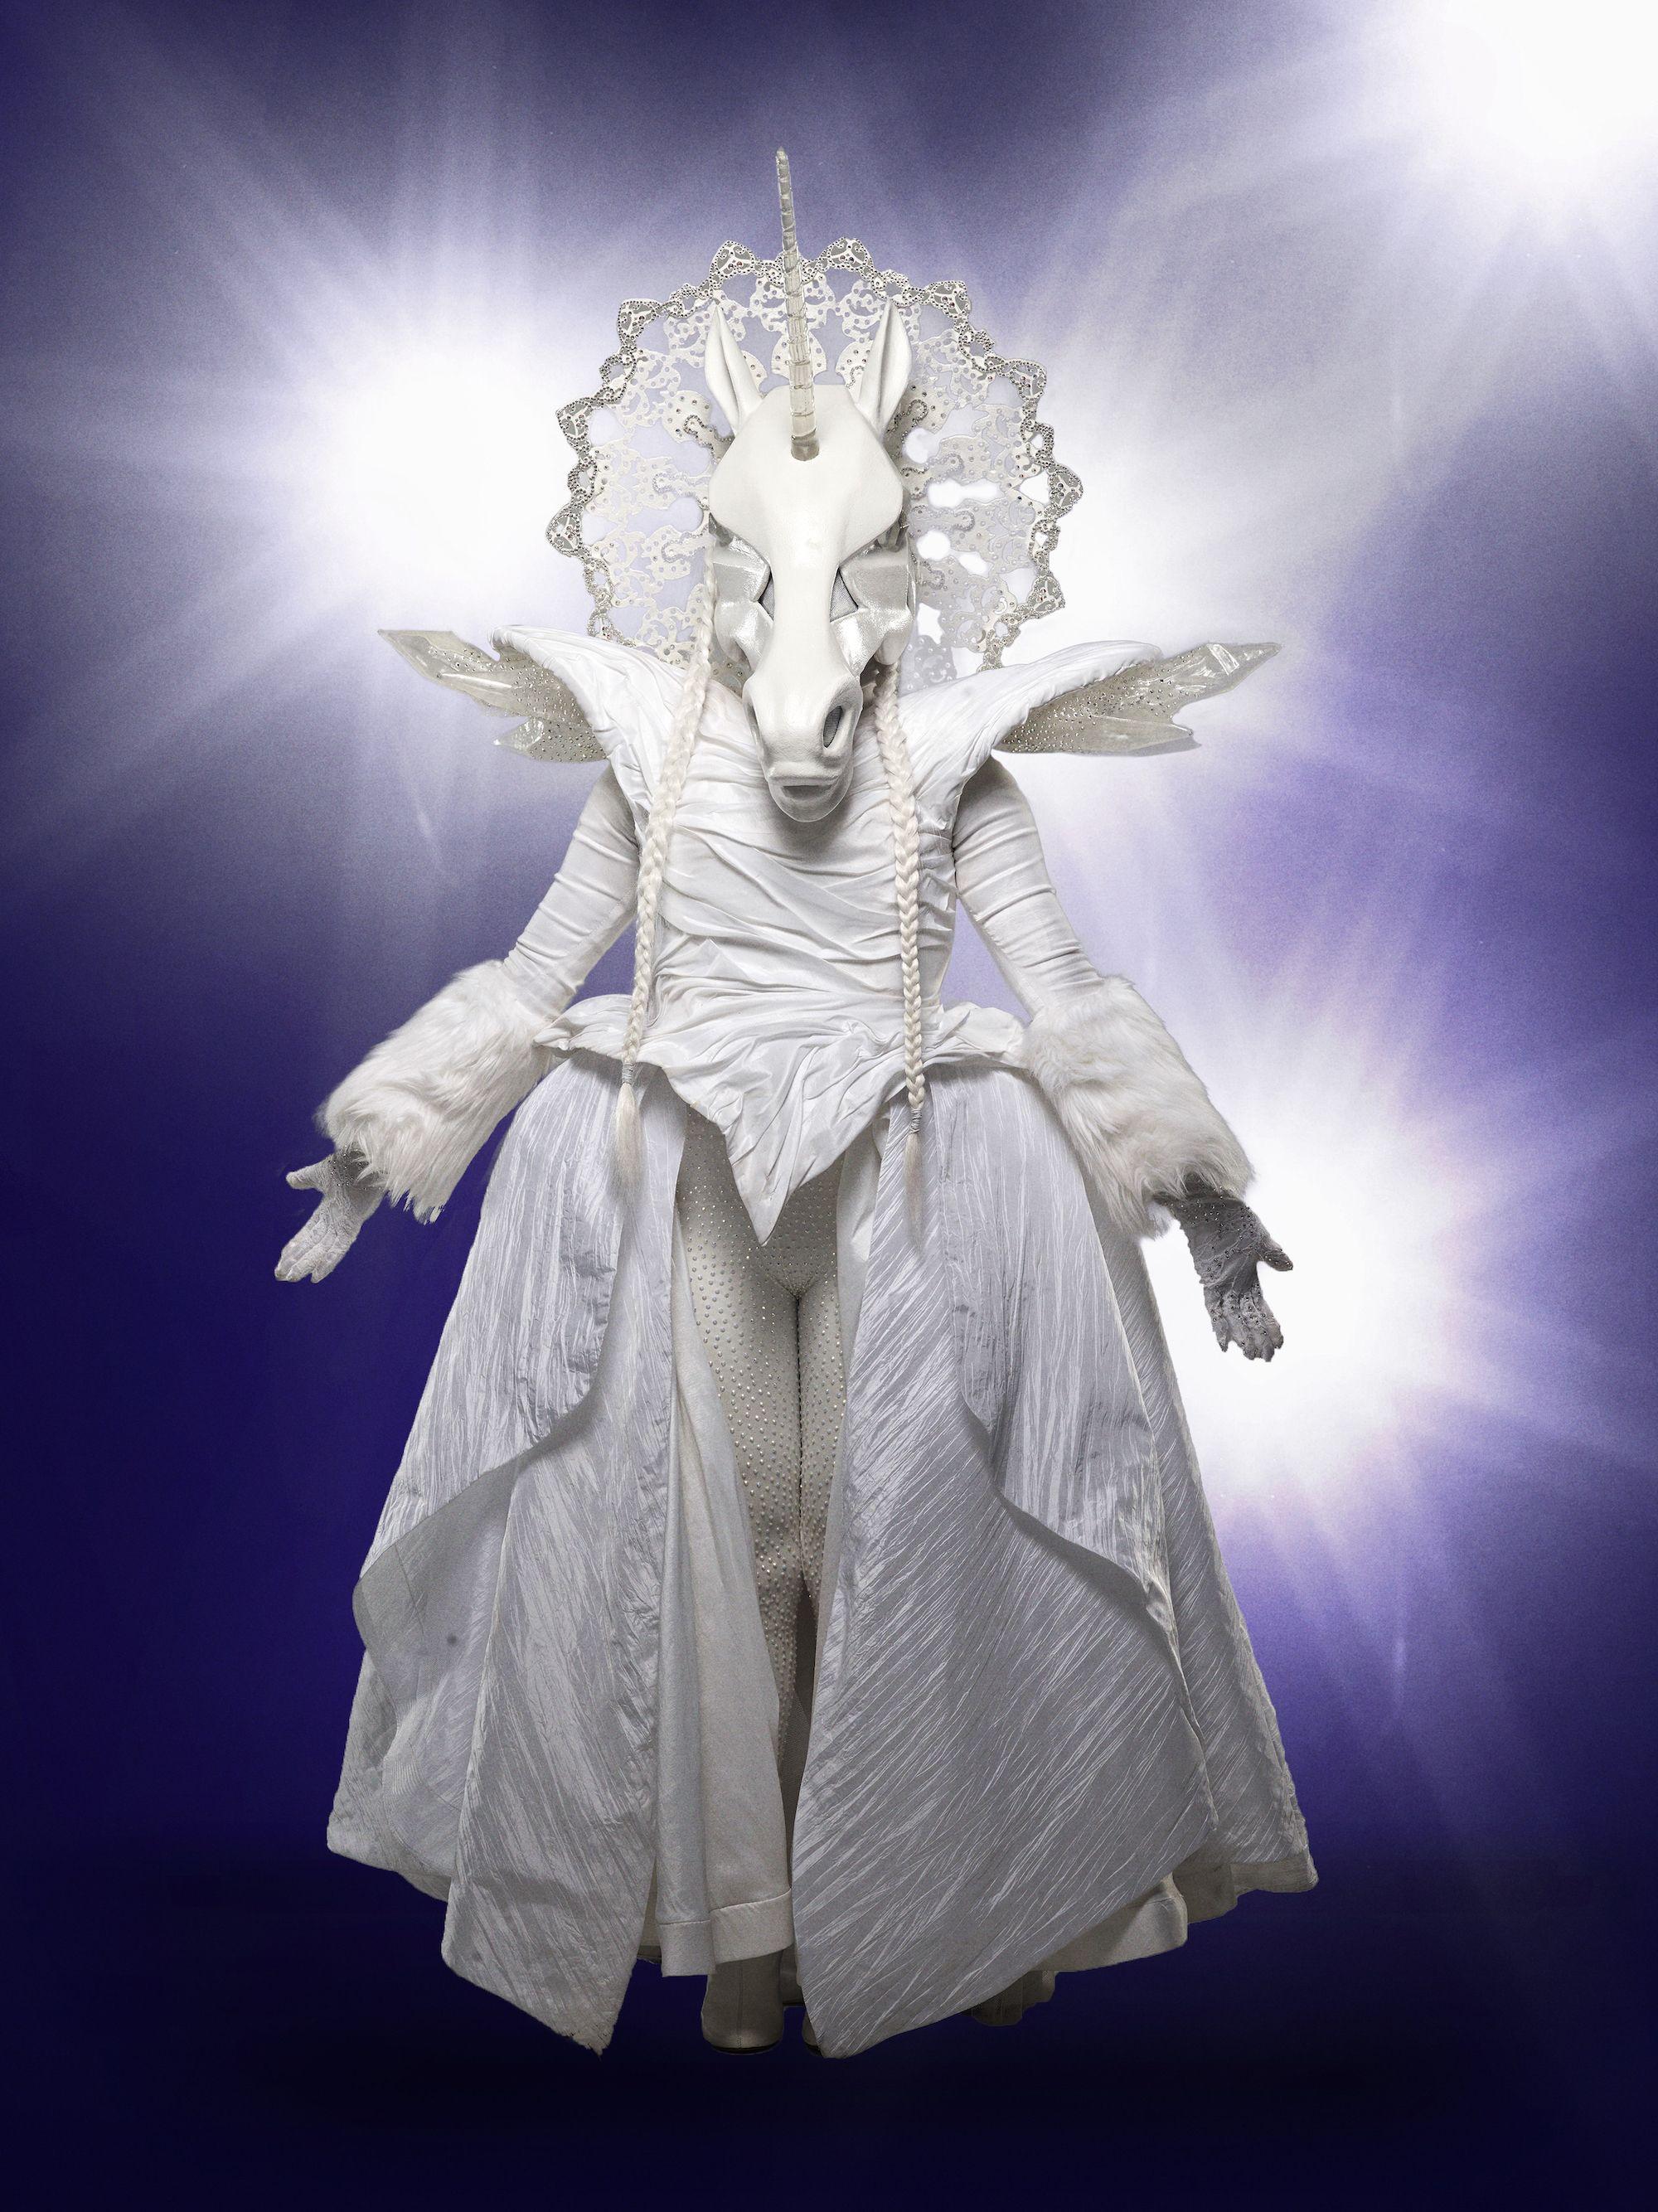 12 \u0027Masked Singer\u0027 Costumes for Halloween 2019 , How to DIY